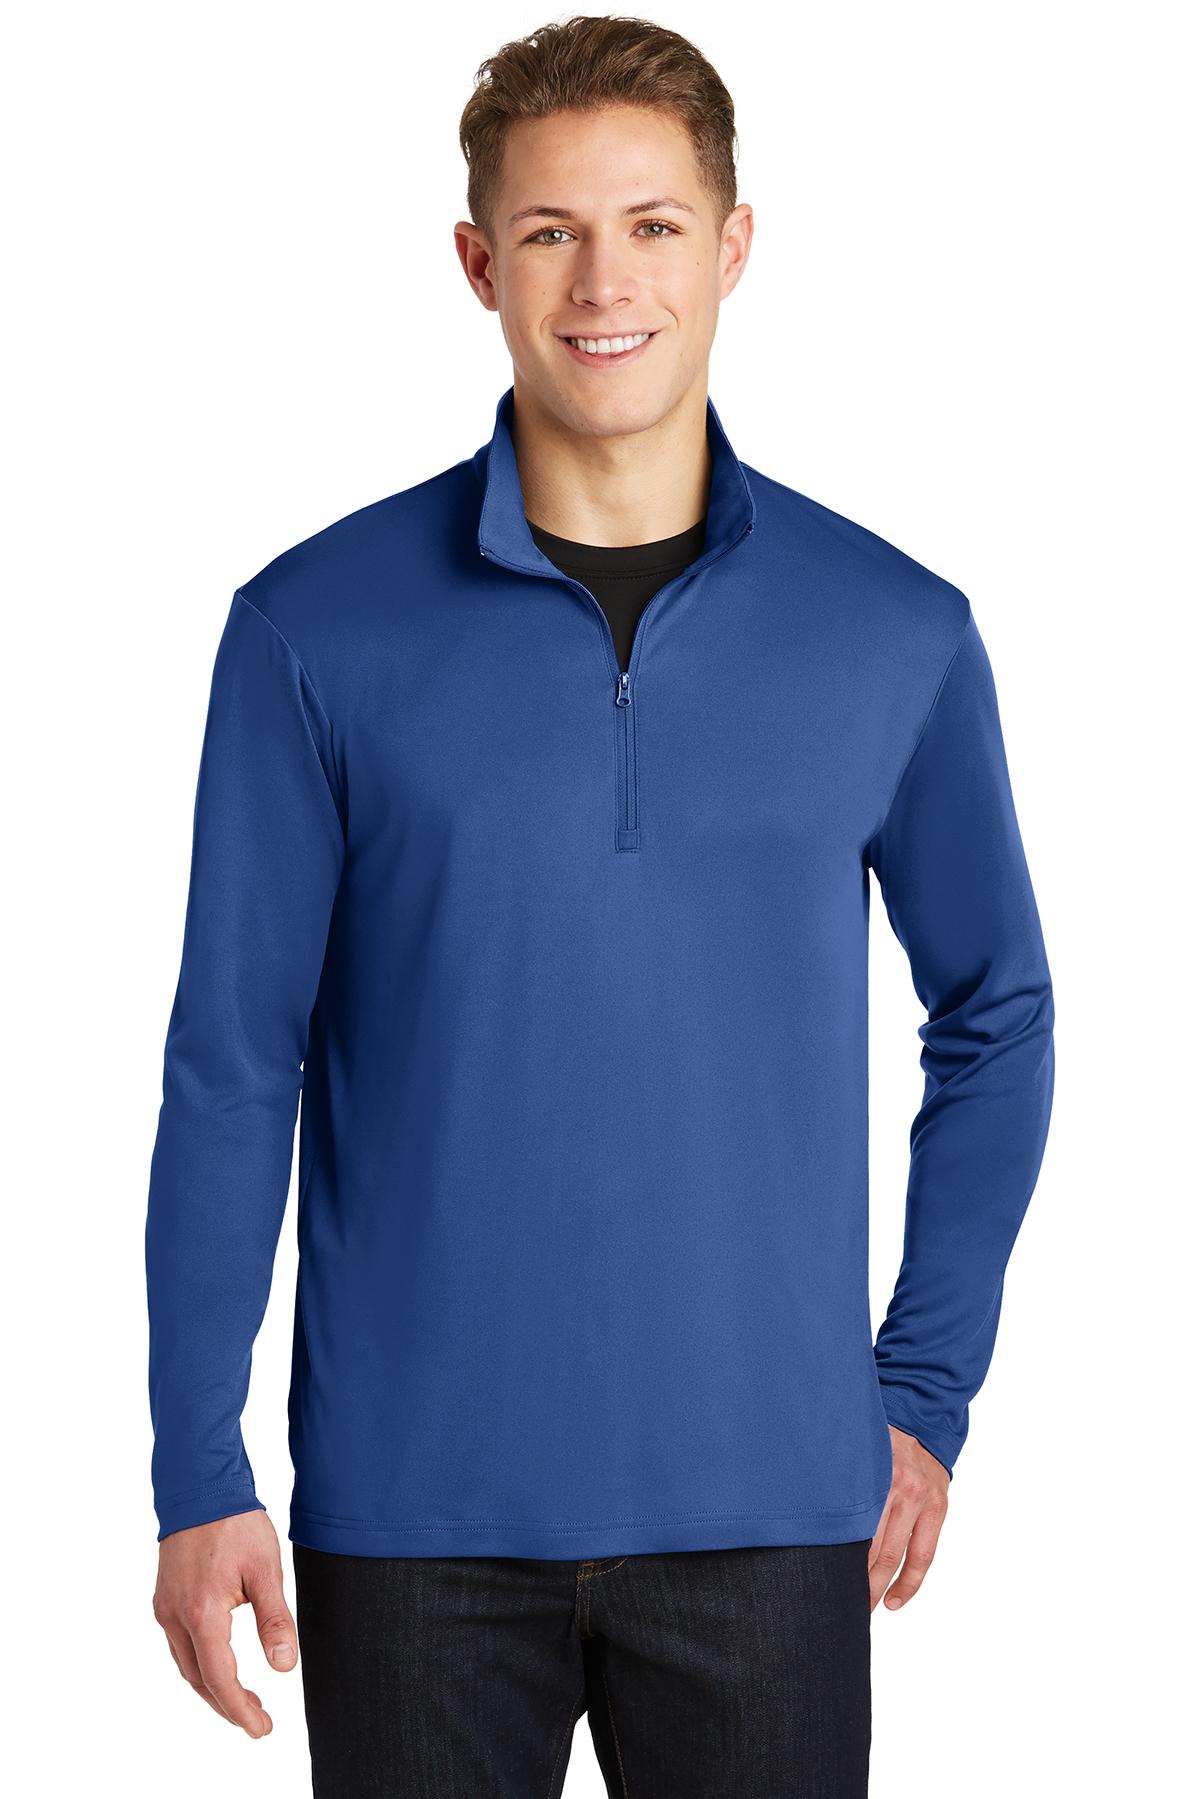 Sport Tek Posicharge Competitor 1 4 Zip Pullover 1 2 1 4 Zip Sweatshirts Fleece Company Casuals Shop hivis supply and get free. company casuals